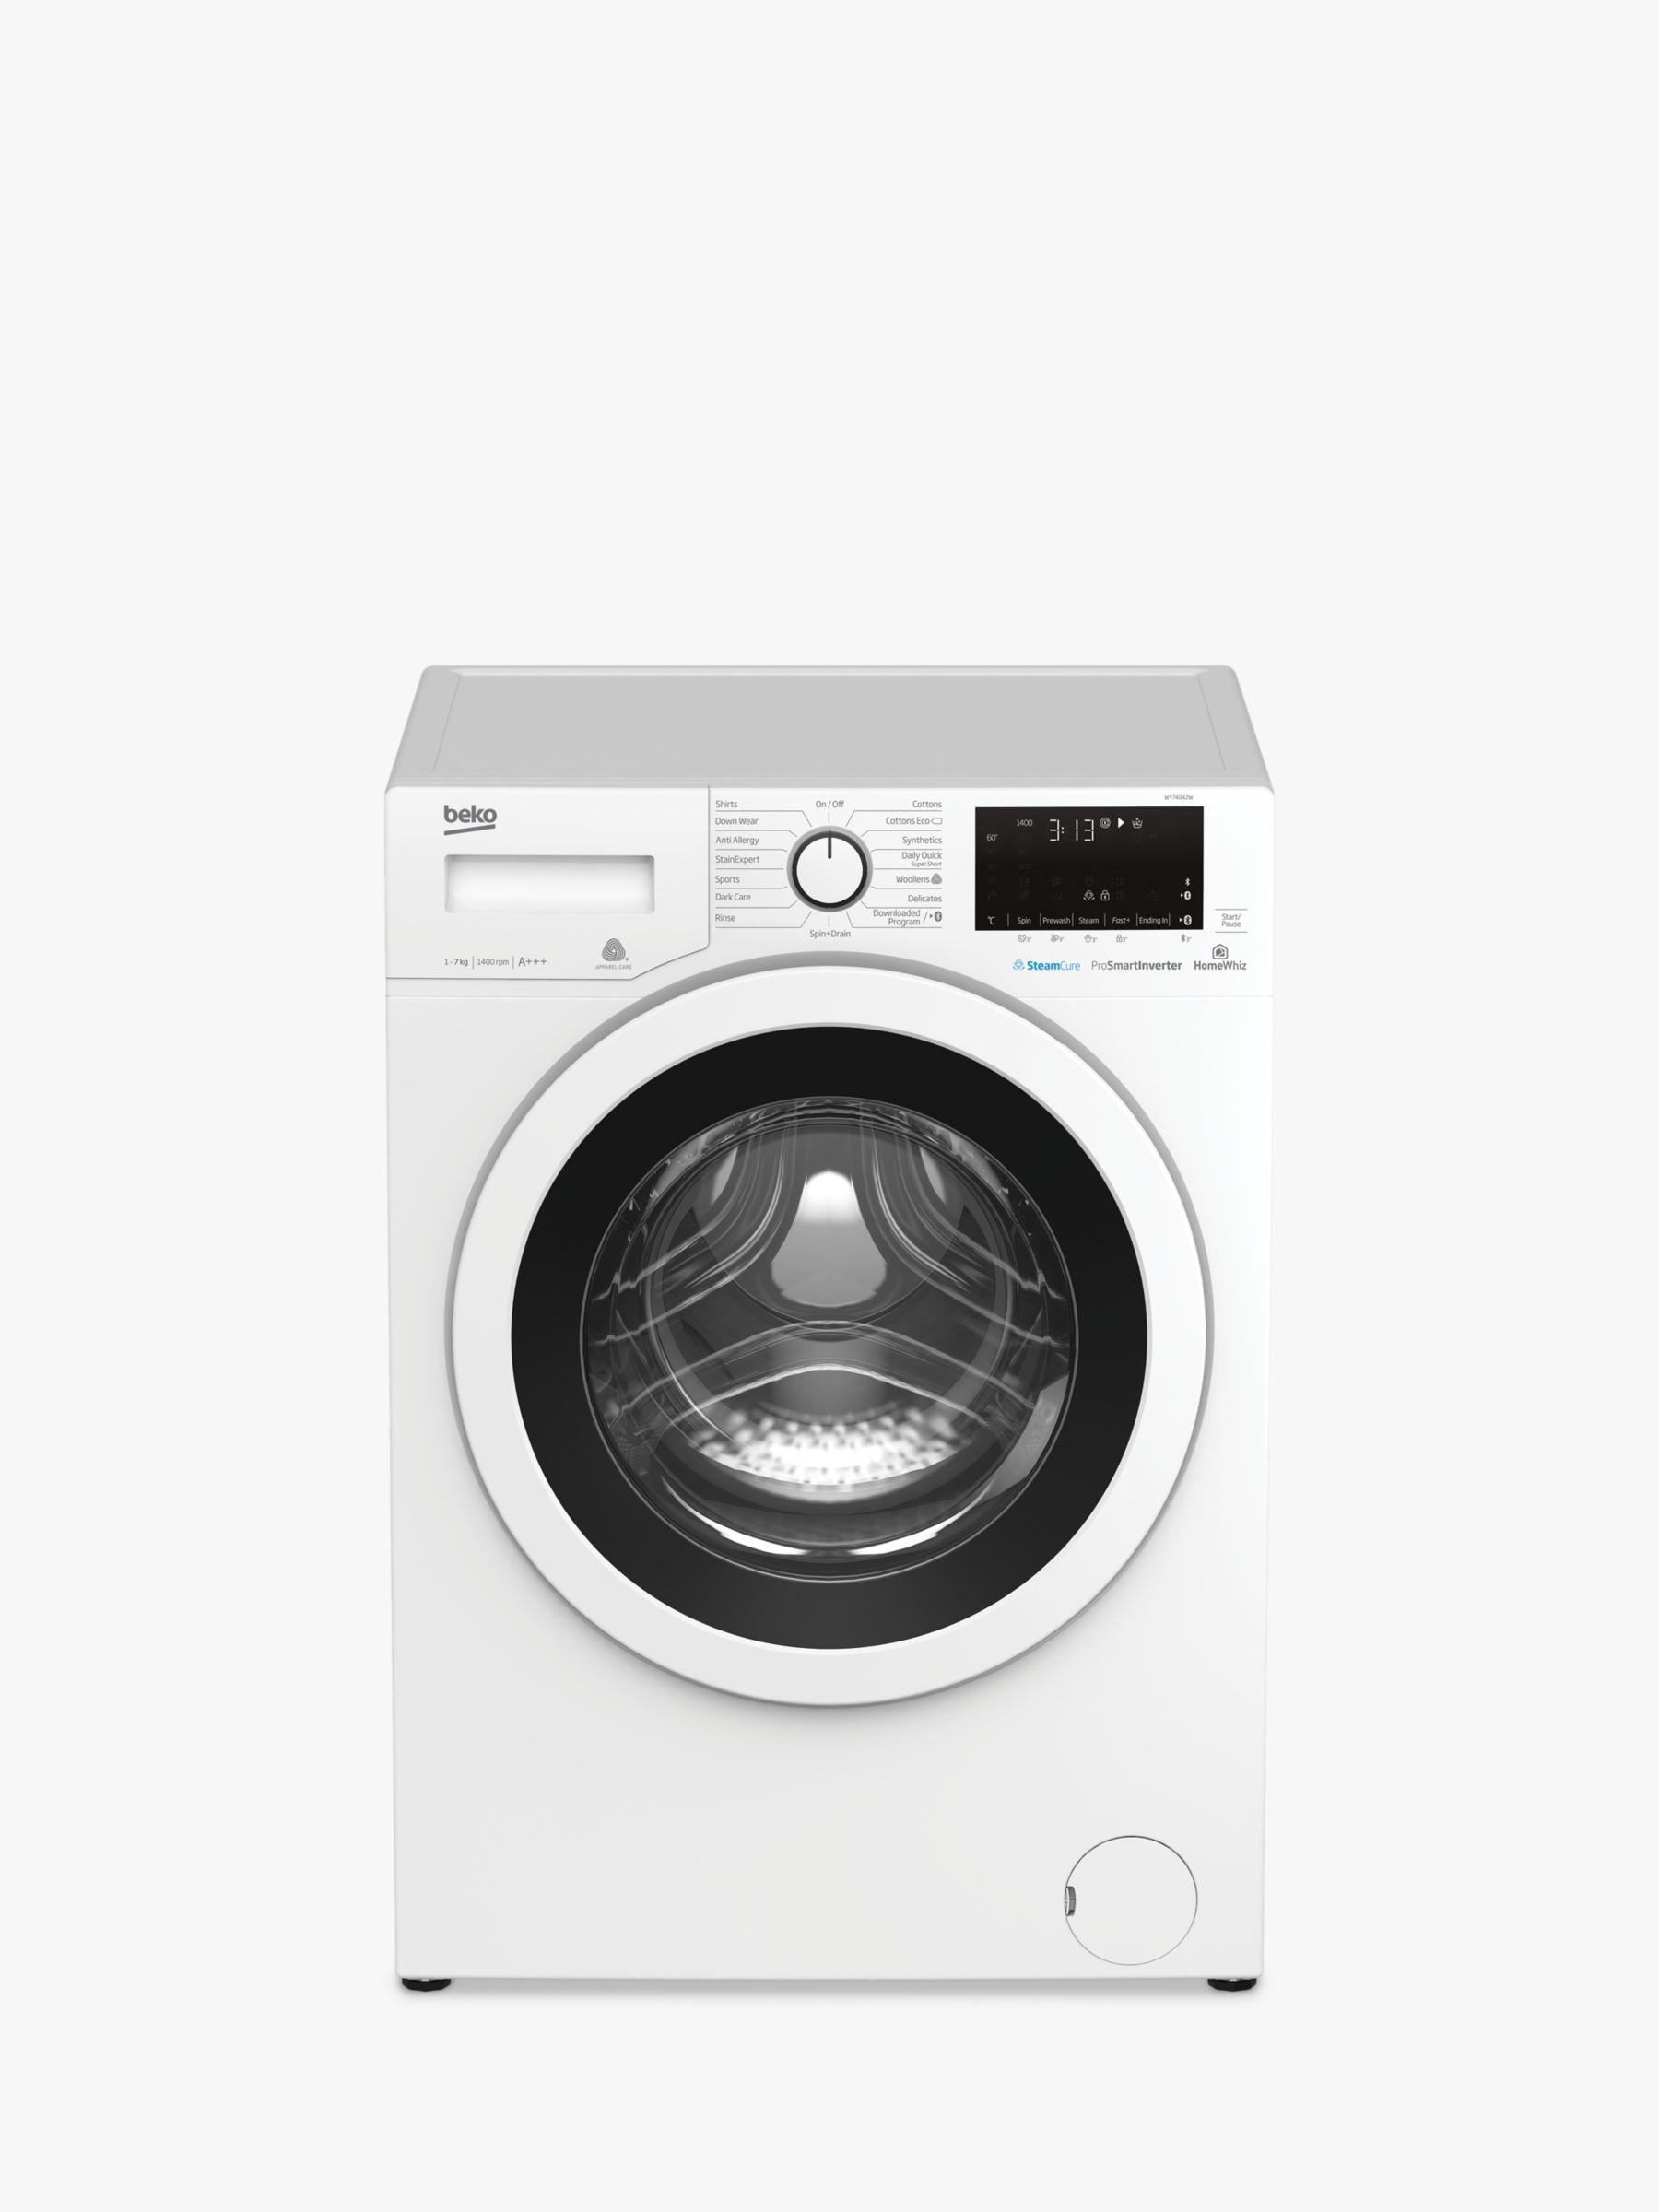 Beko Beko WY74042W Freestanding Washing Machine, 7kg Load, A+++ Energy Rating, 1400rpm, White